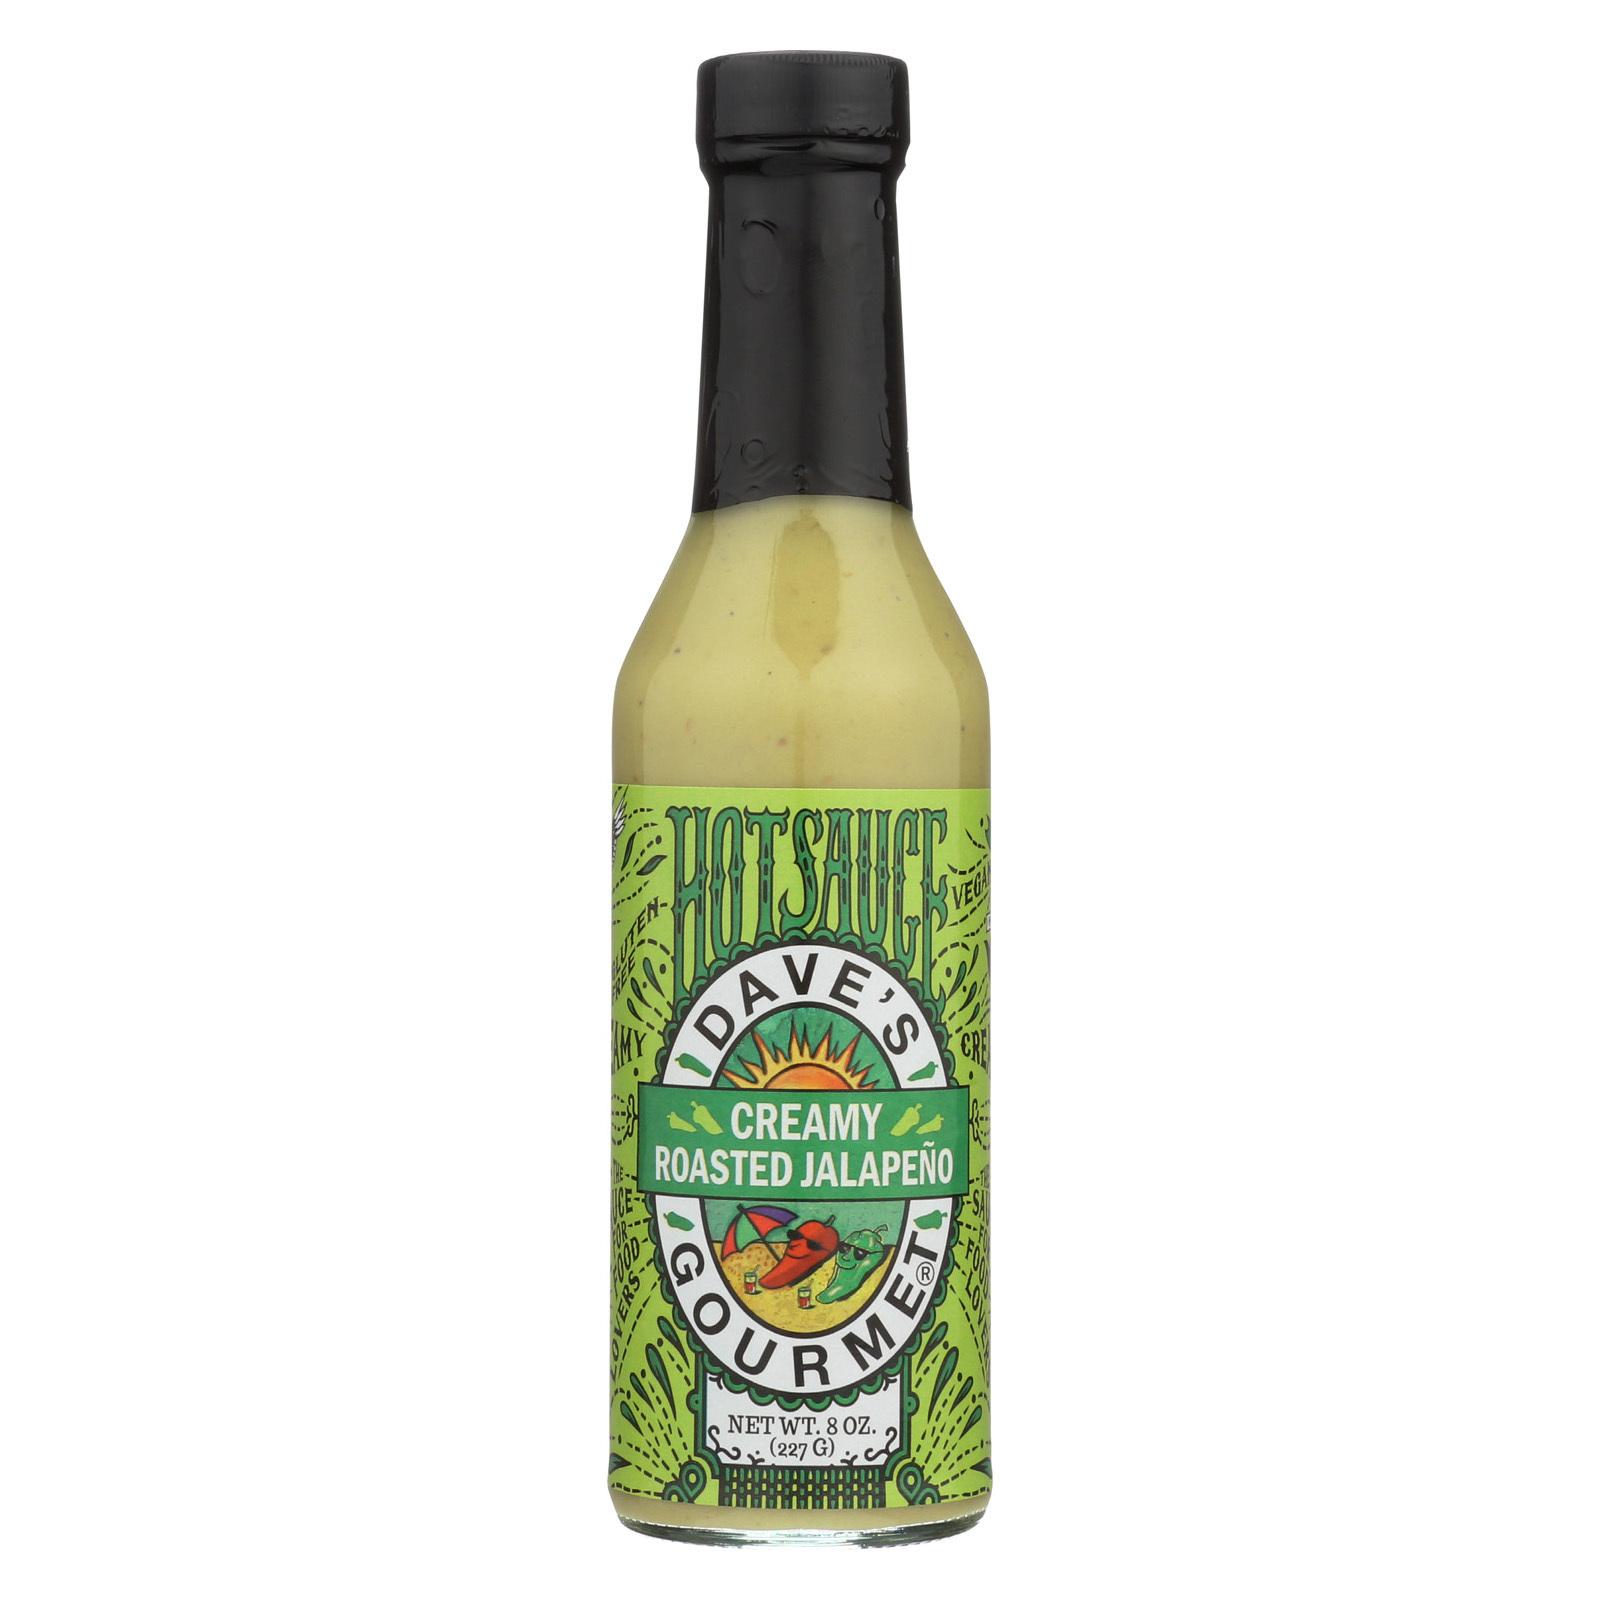 Dave's Gourmet Hot Sauce - Creamy Roasted Jalapeno - Case of 6 - 8 fl oz